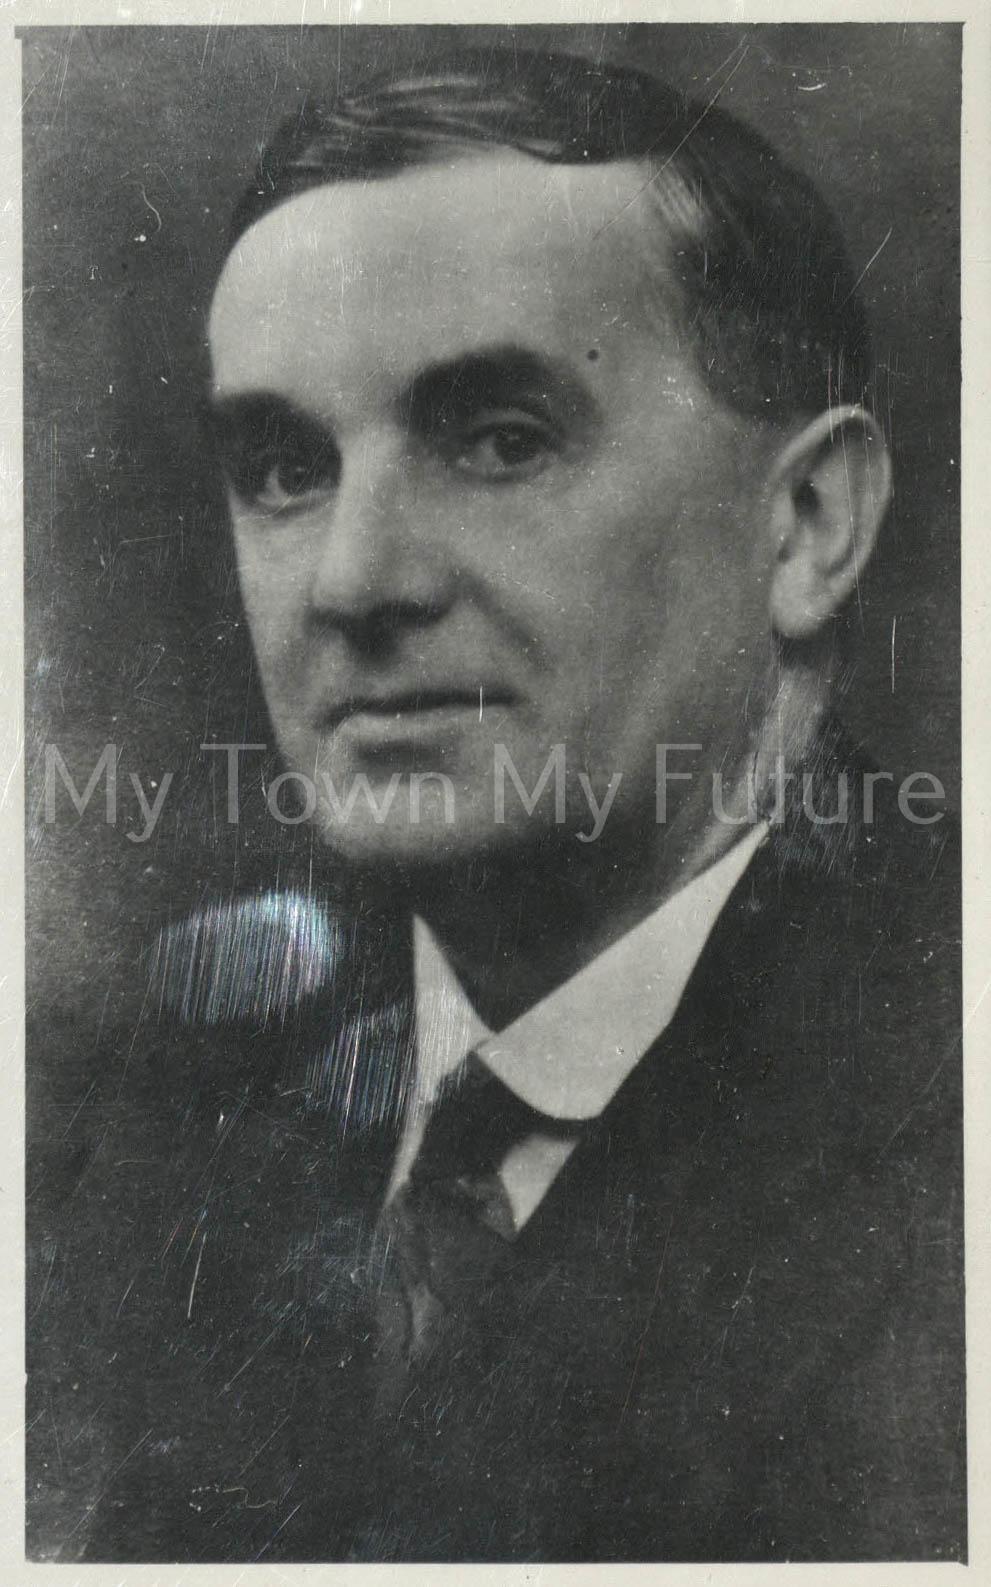 Ian. J. Chapman